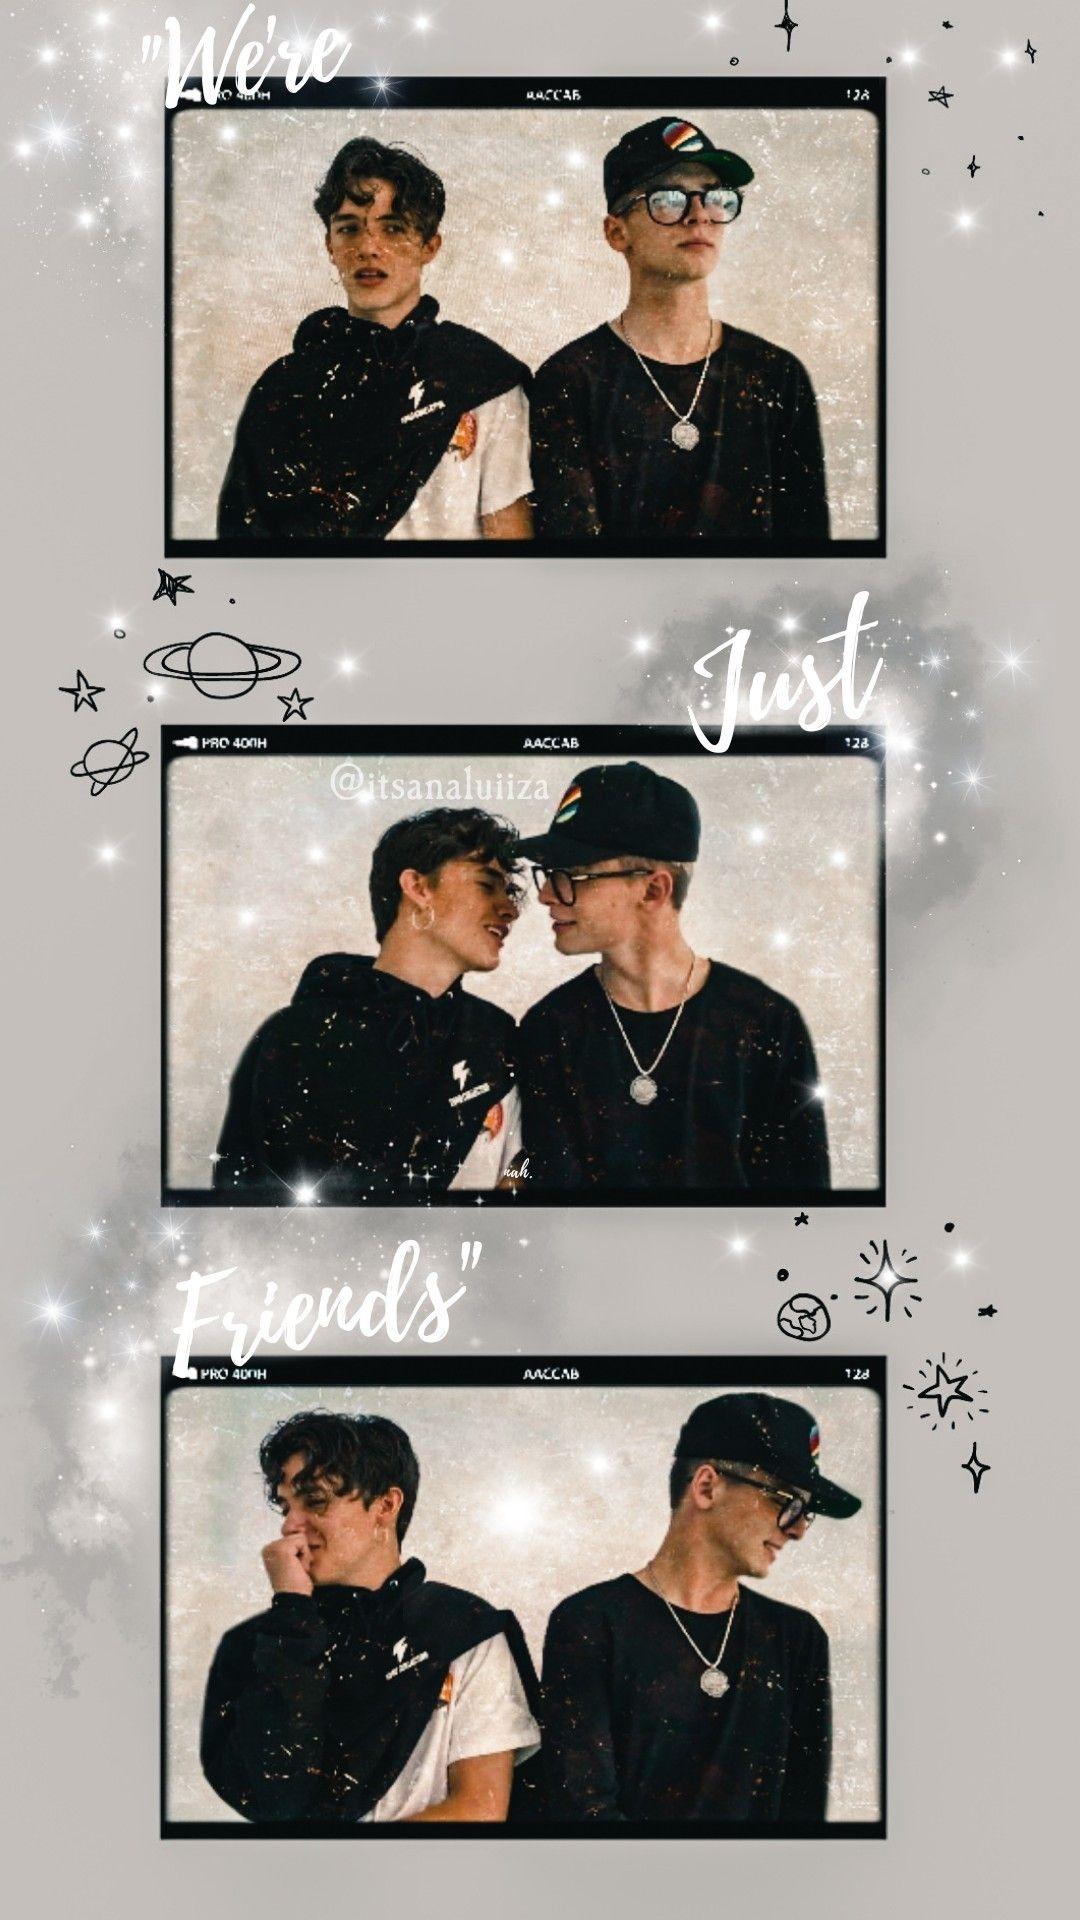 Noah And Josh Aesthetic The Now United Show S2e10 Papeis De